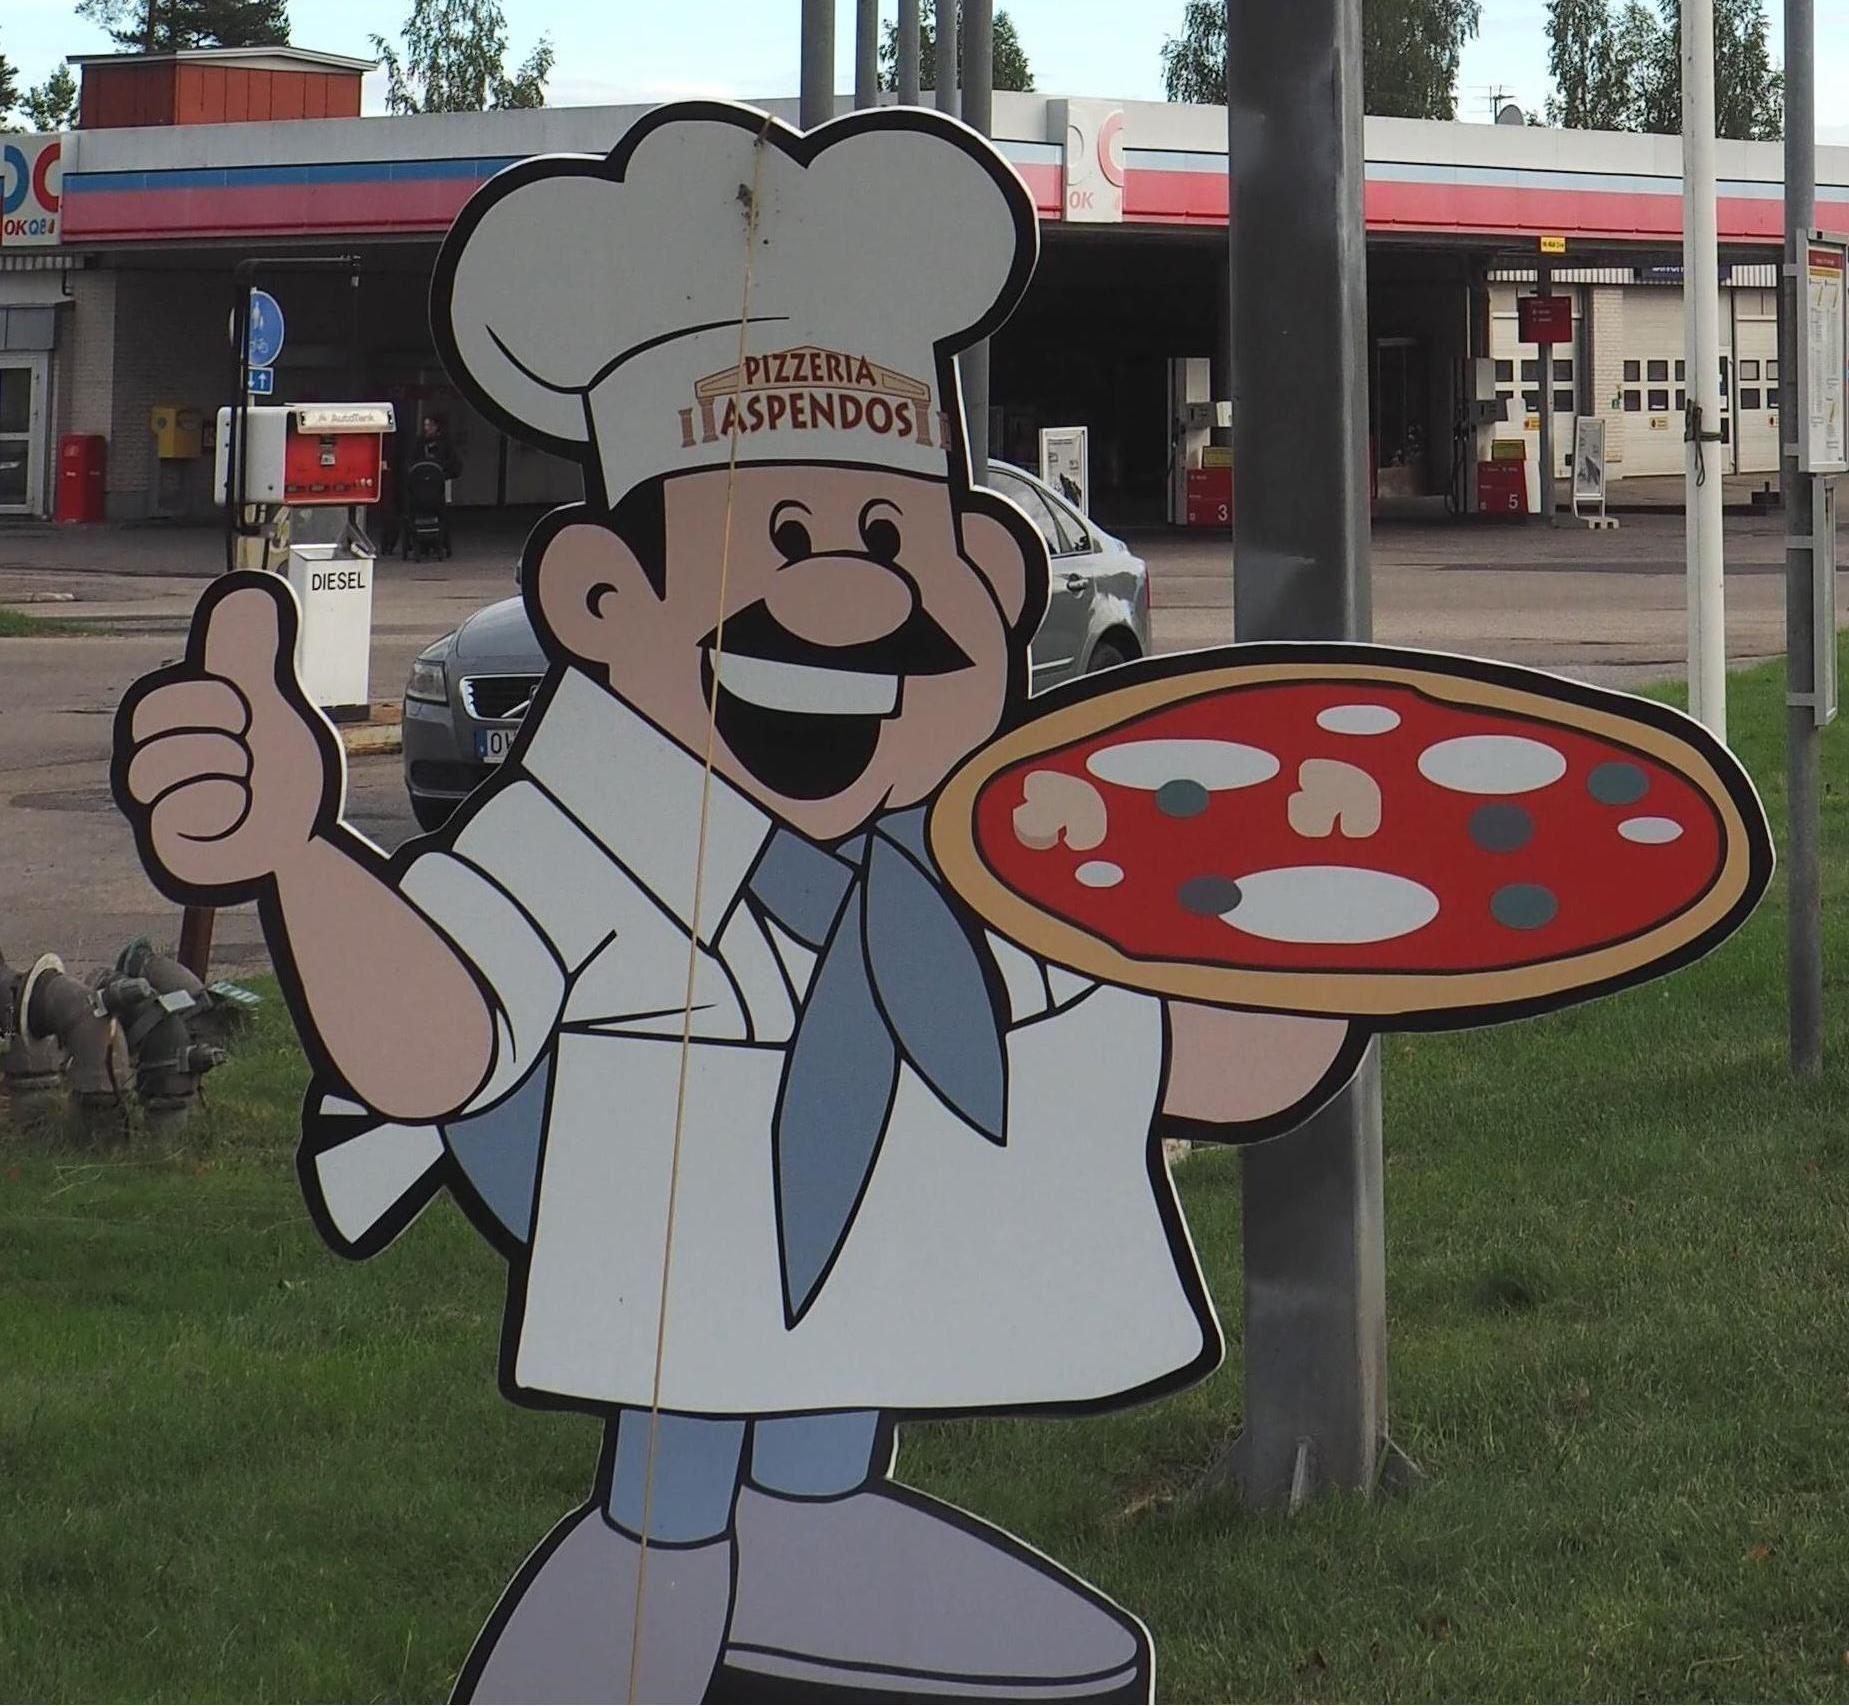 Pizzeria Aspendos